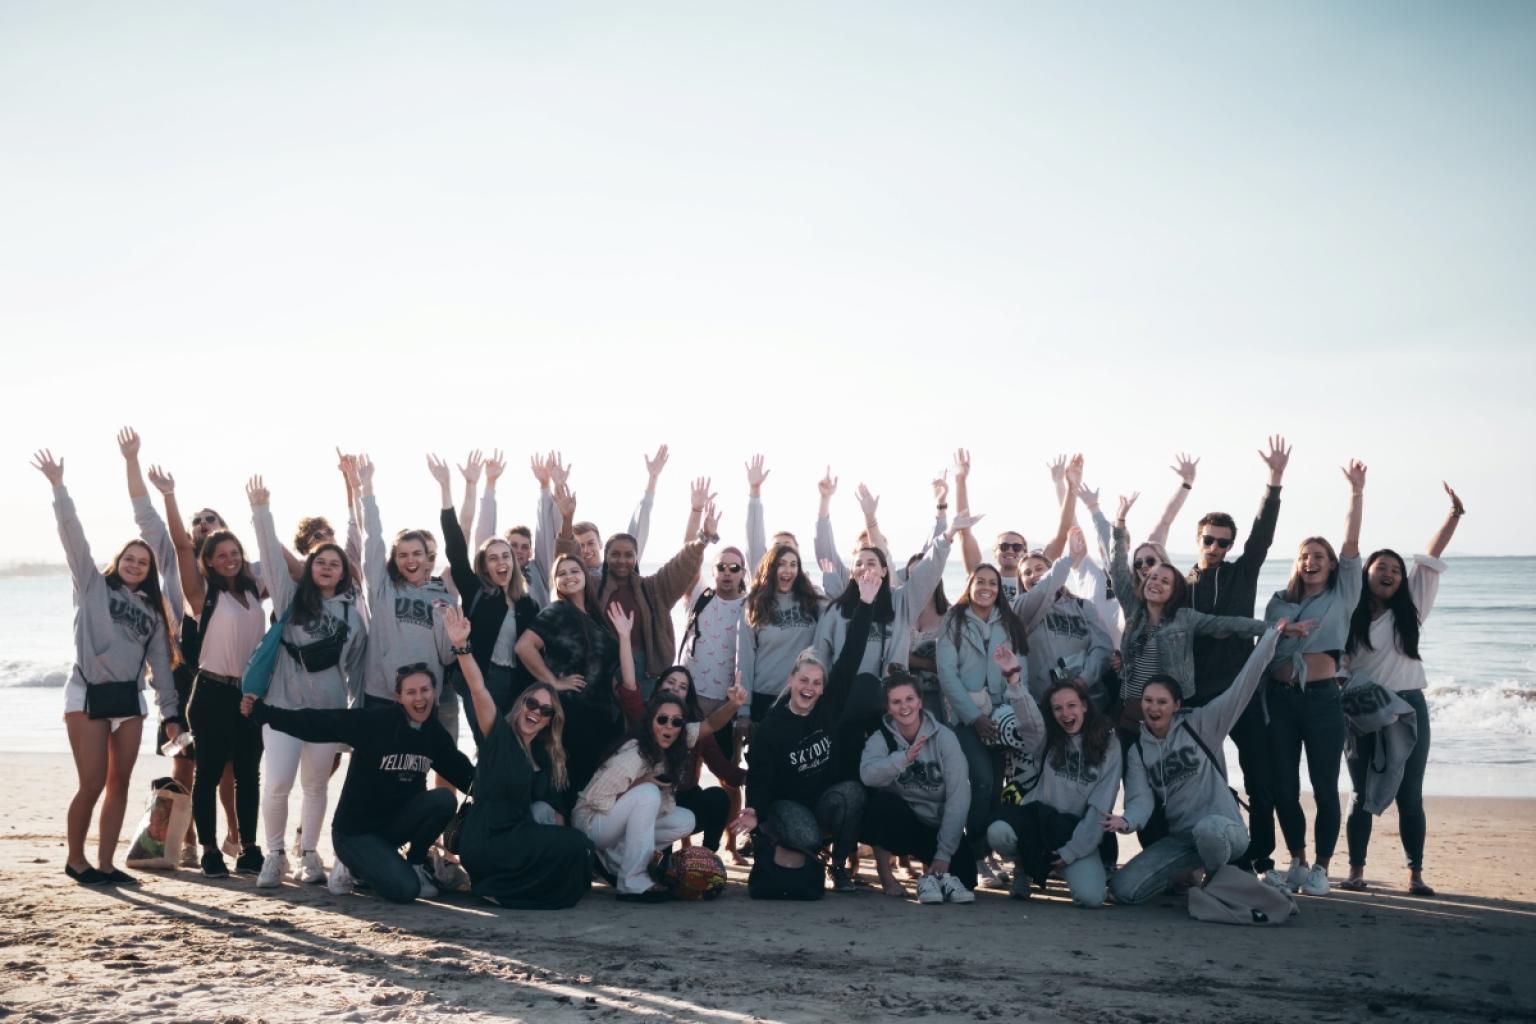 Recuni City Pictures International_Ambassador_Students_Mooloolaba_Beach__Winter___1_